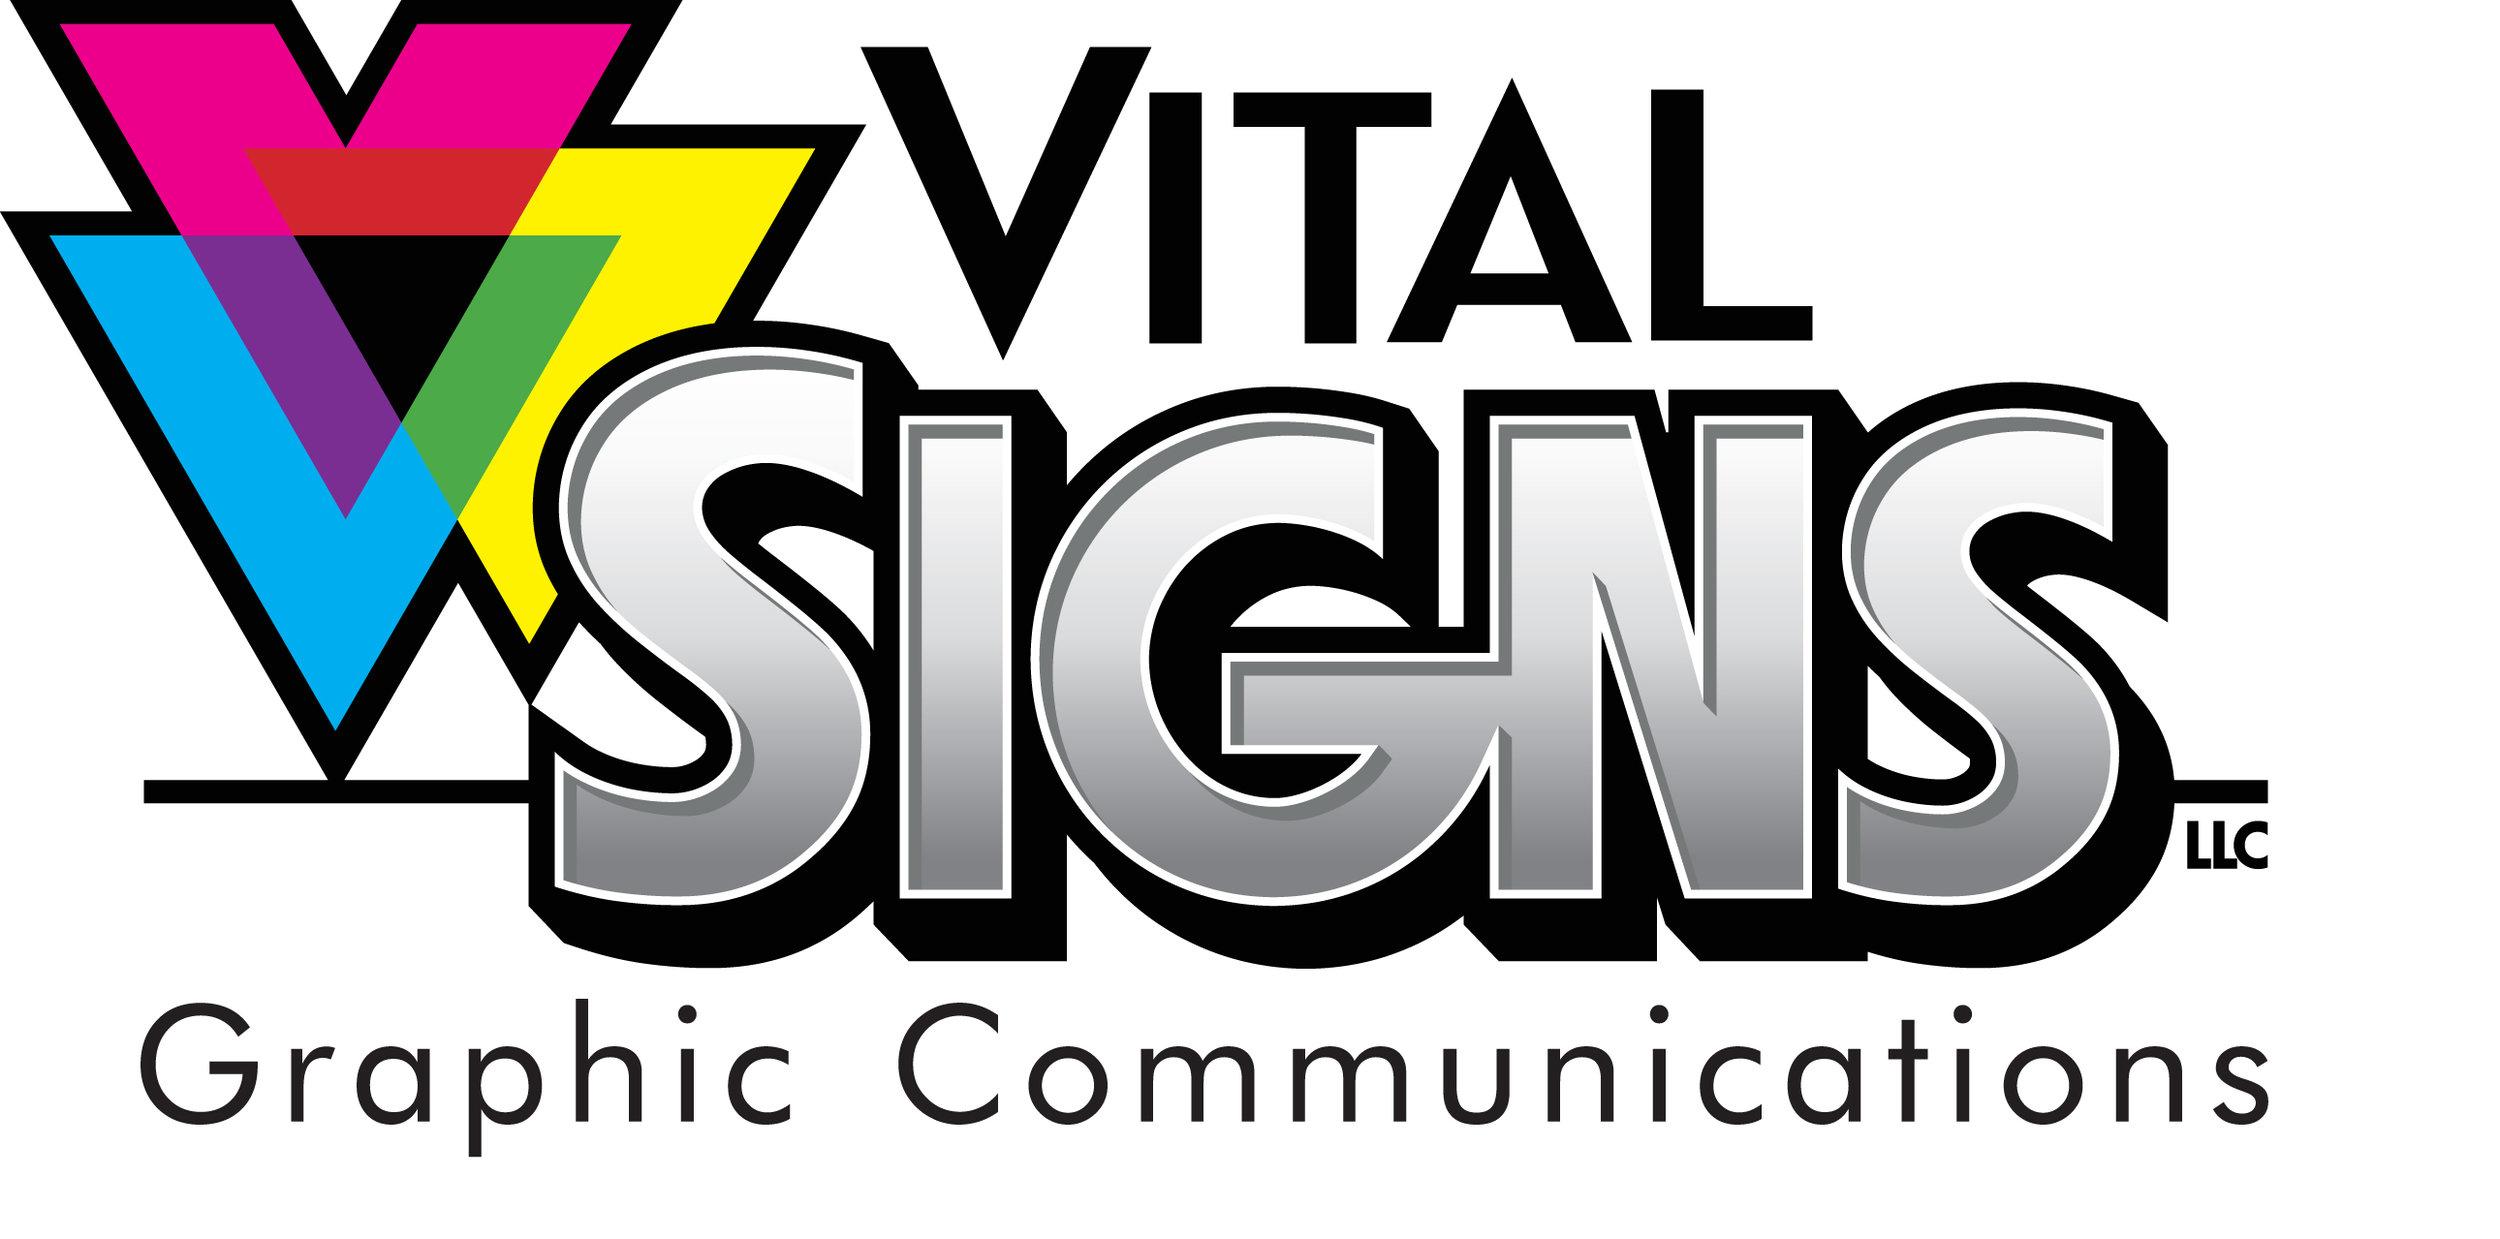 Vital signs logo color.jpg